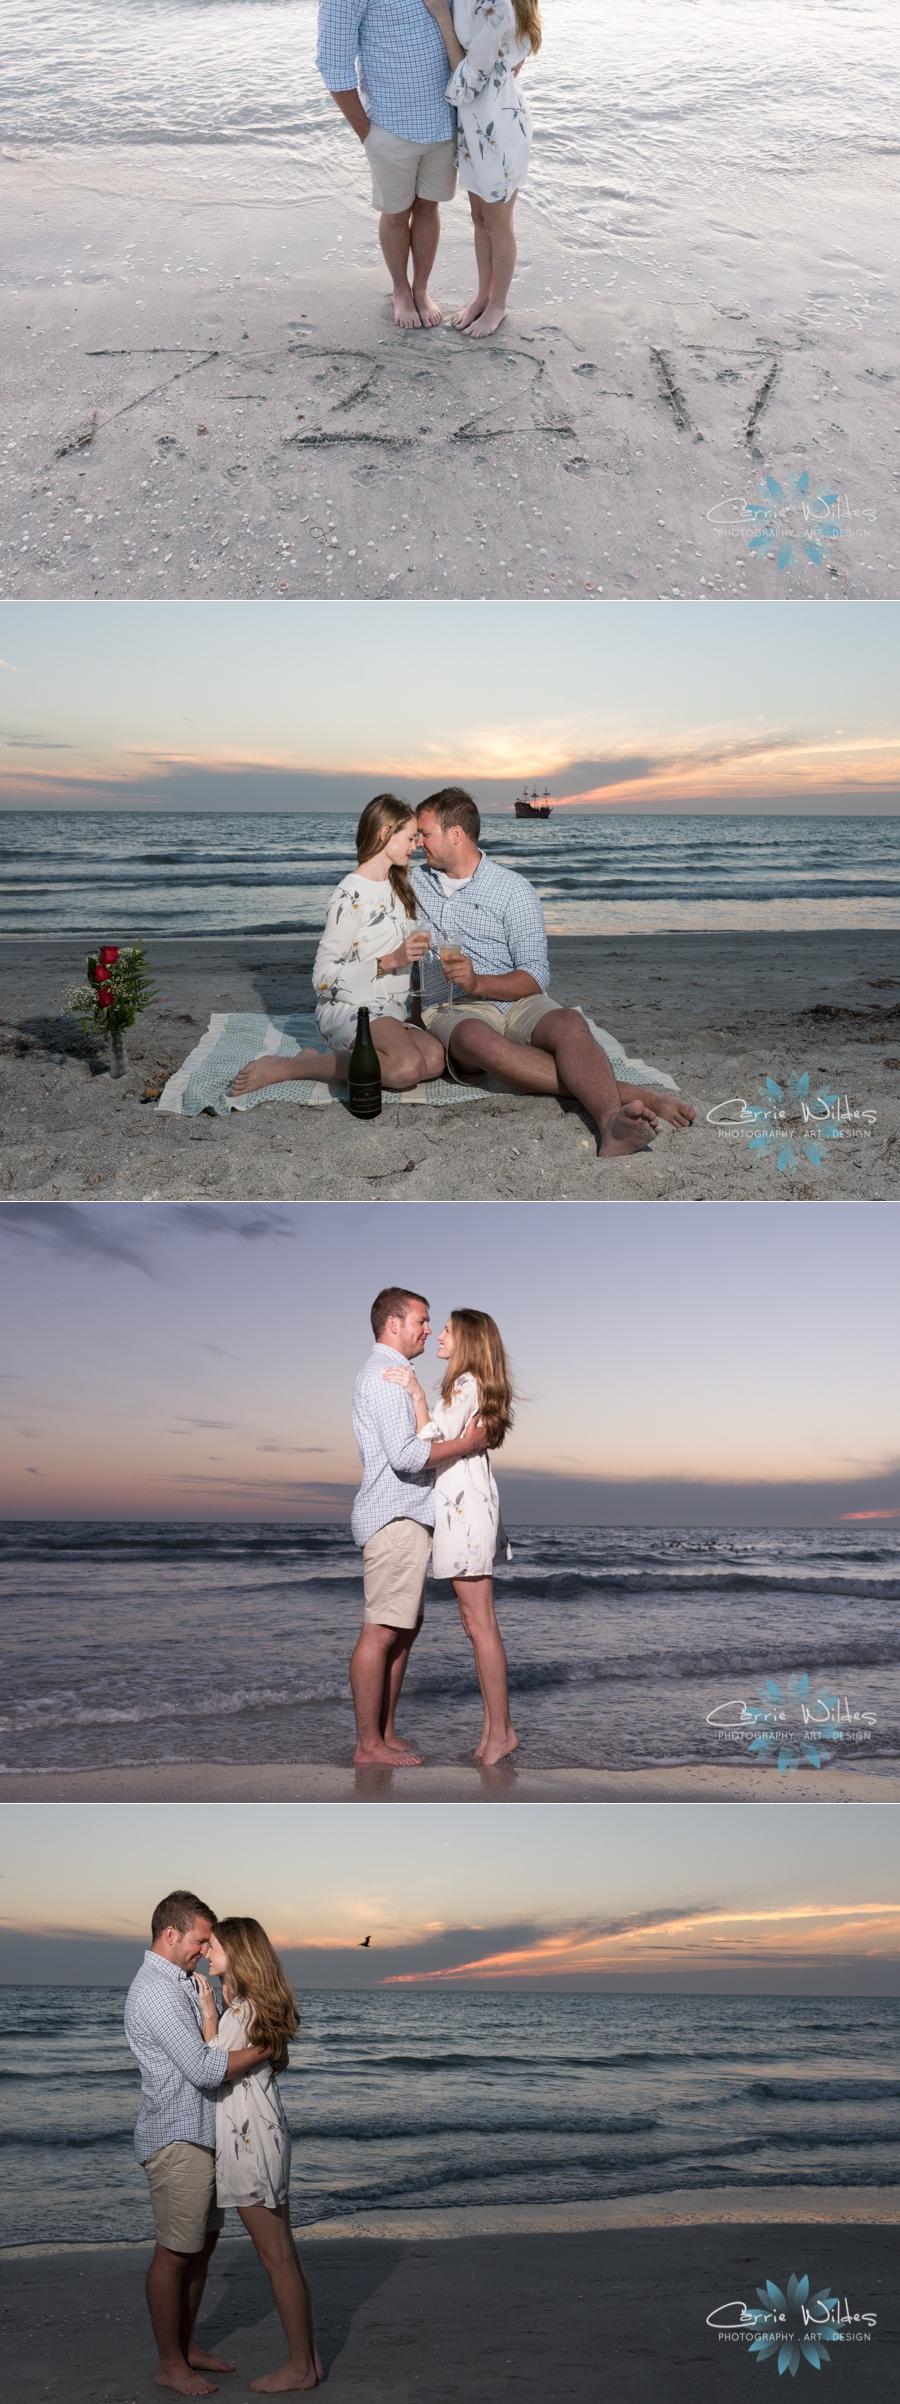 4_1_17 Cassie and Scott Sandy Key Beach Engagement Photos 07.jpg